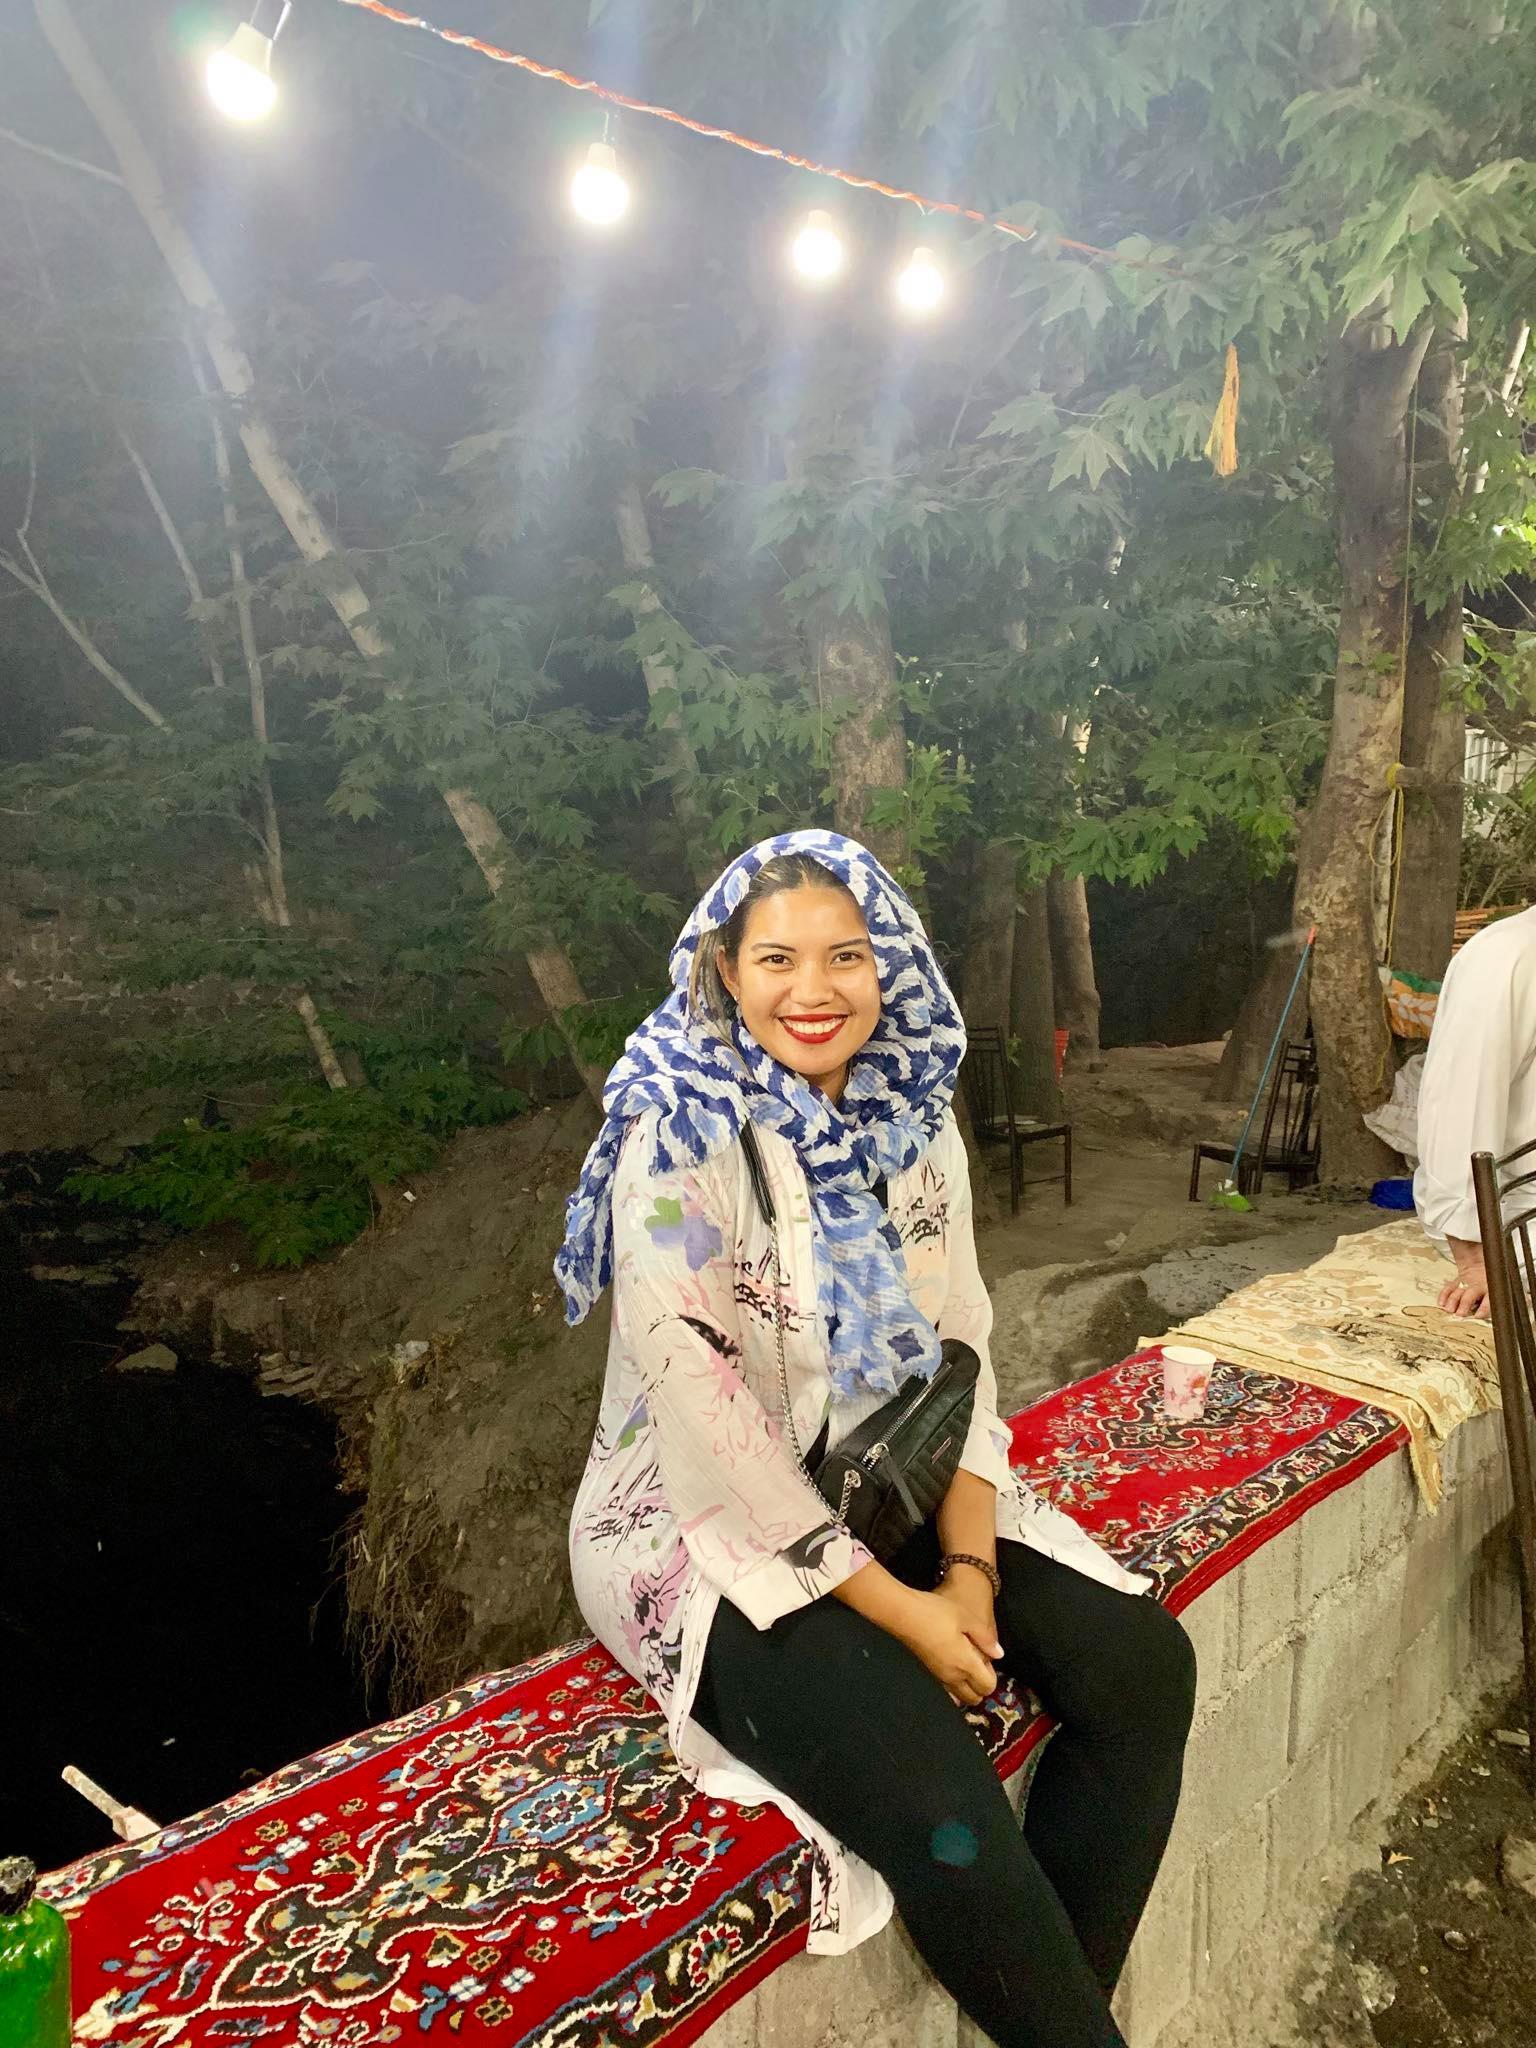 Kach Solo Travels in 2019 Overnight in Mashhad23.jpg